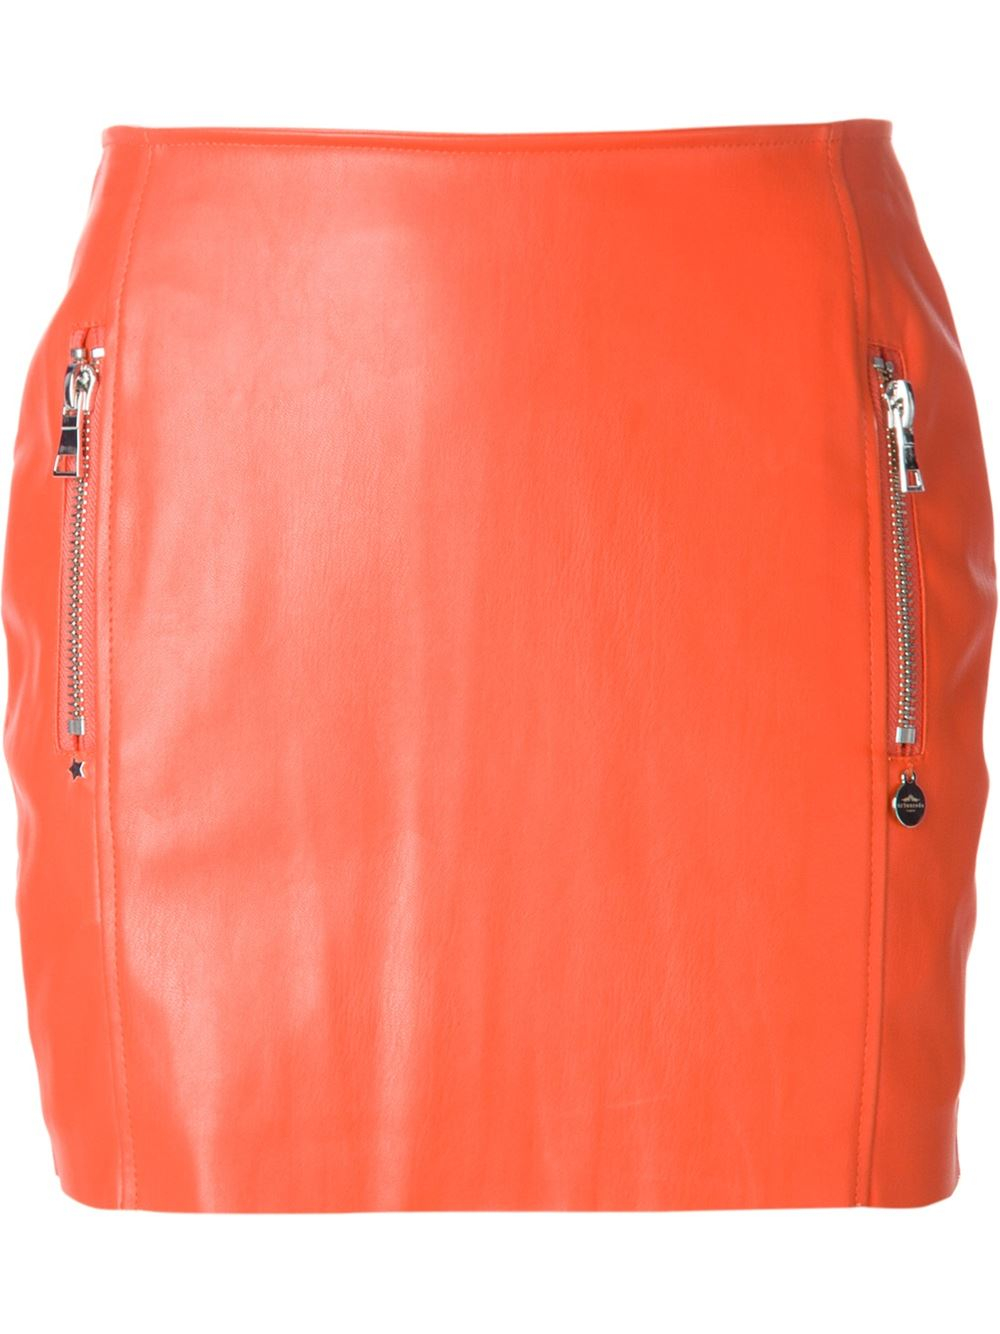 urbancode faux leather skirt in orange lyst